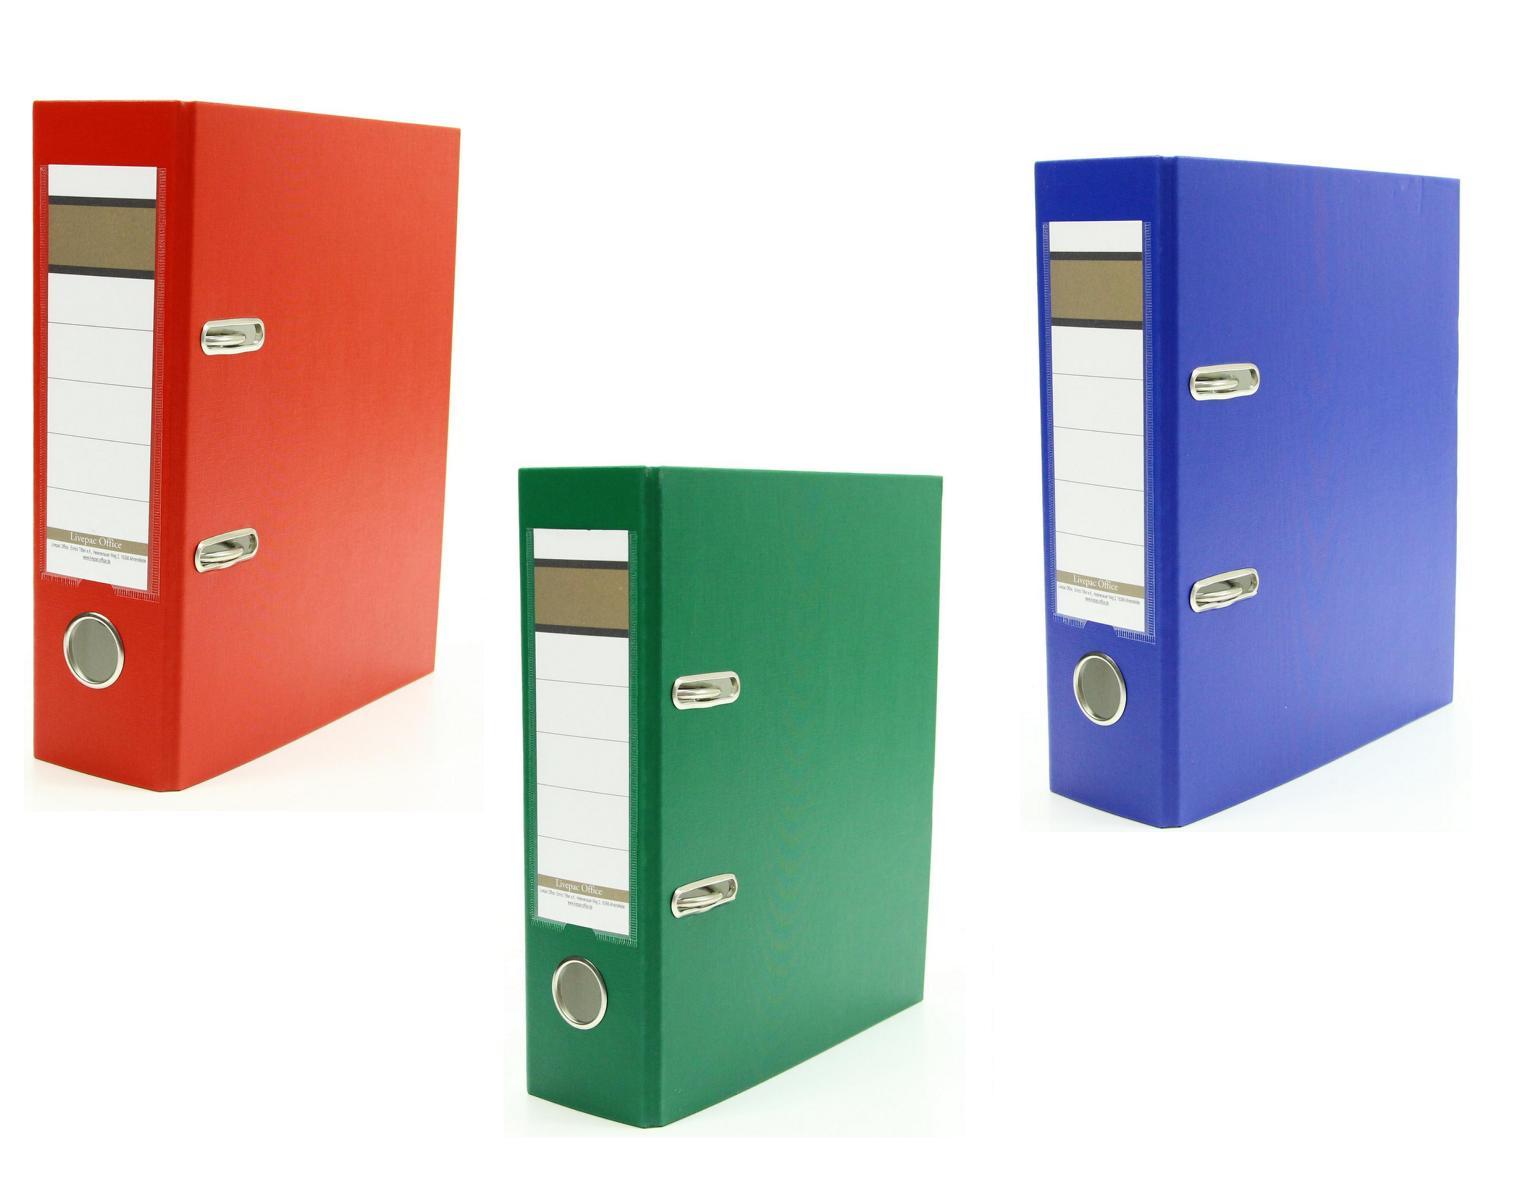 3x Ordner Din A5 75mm Farbe Je 1x Blau Rot Und Grun Ebay